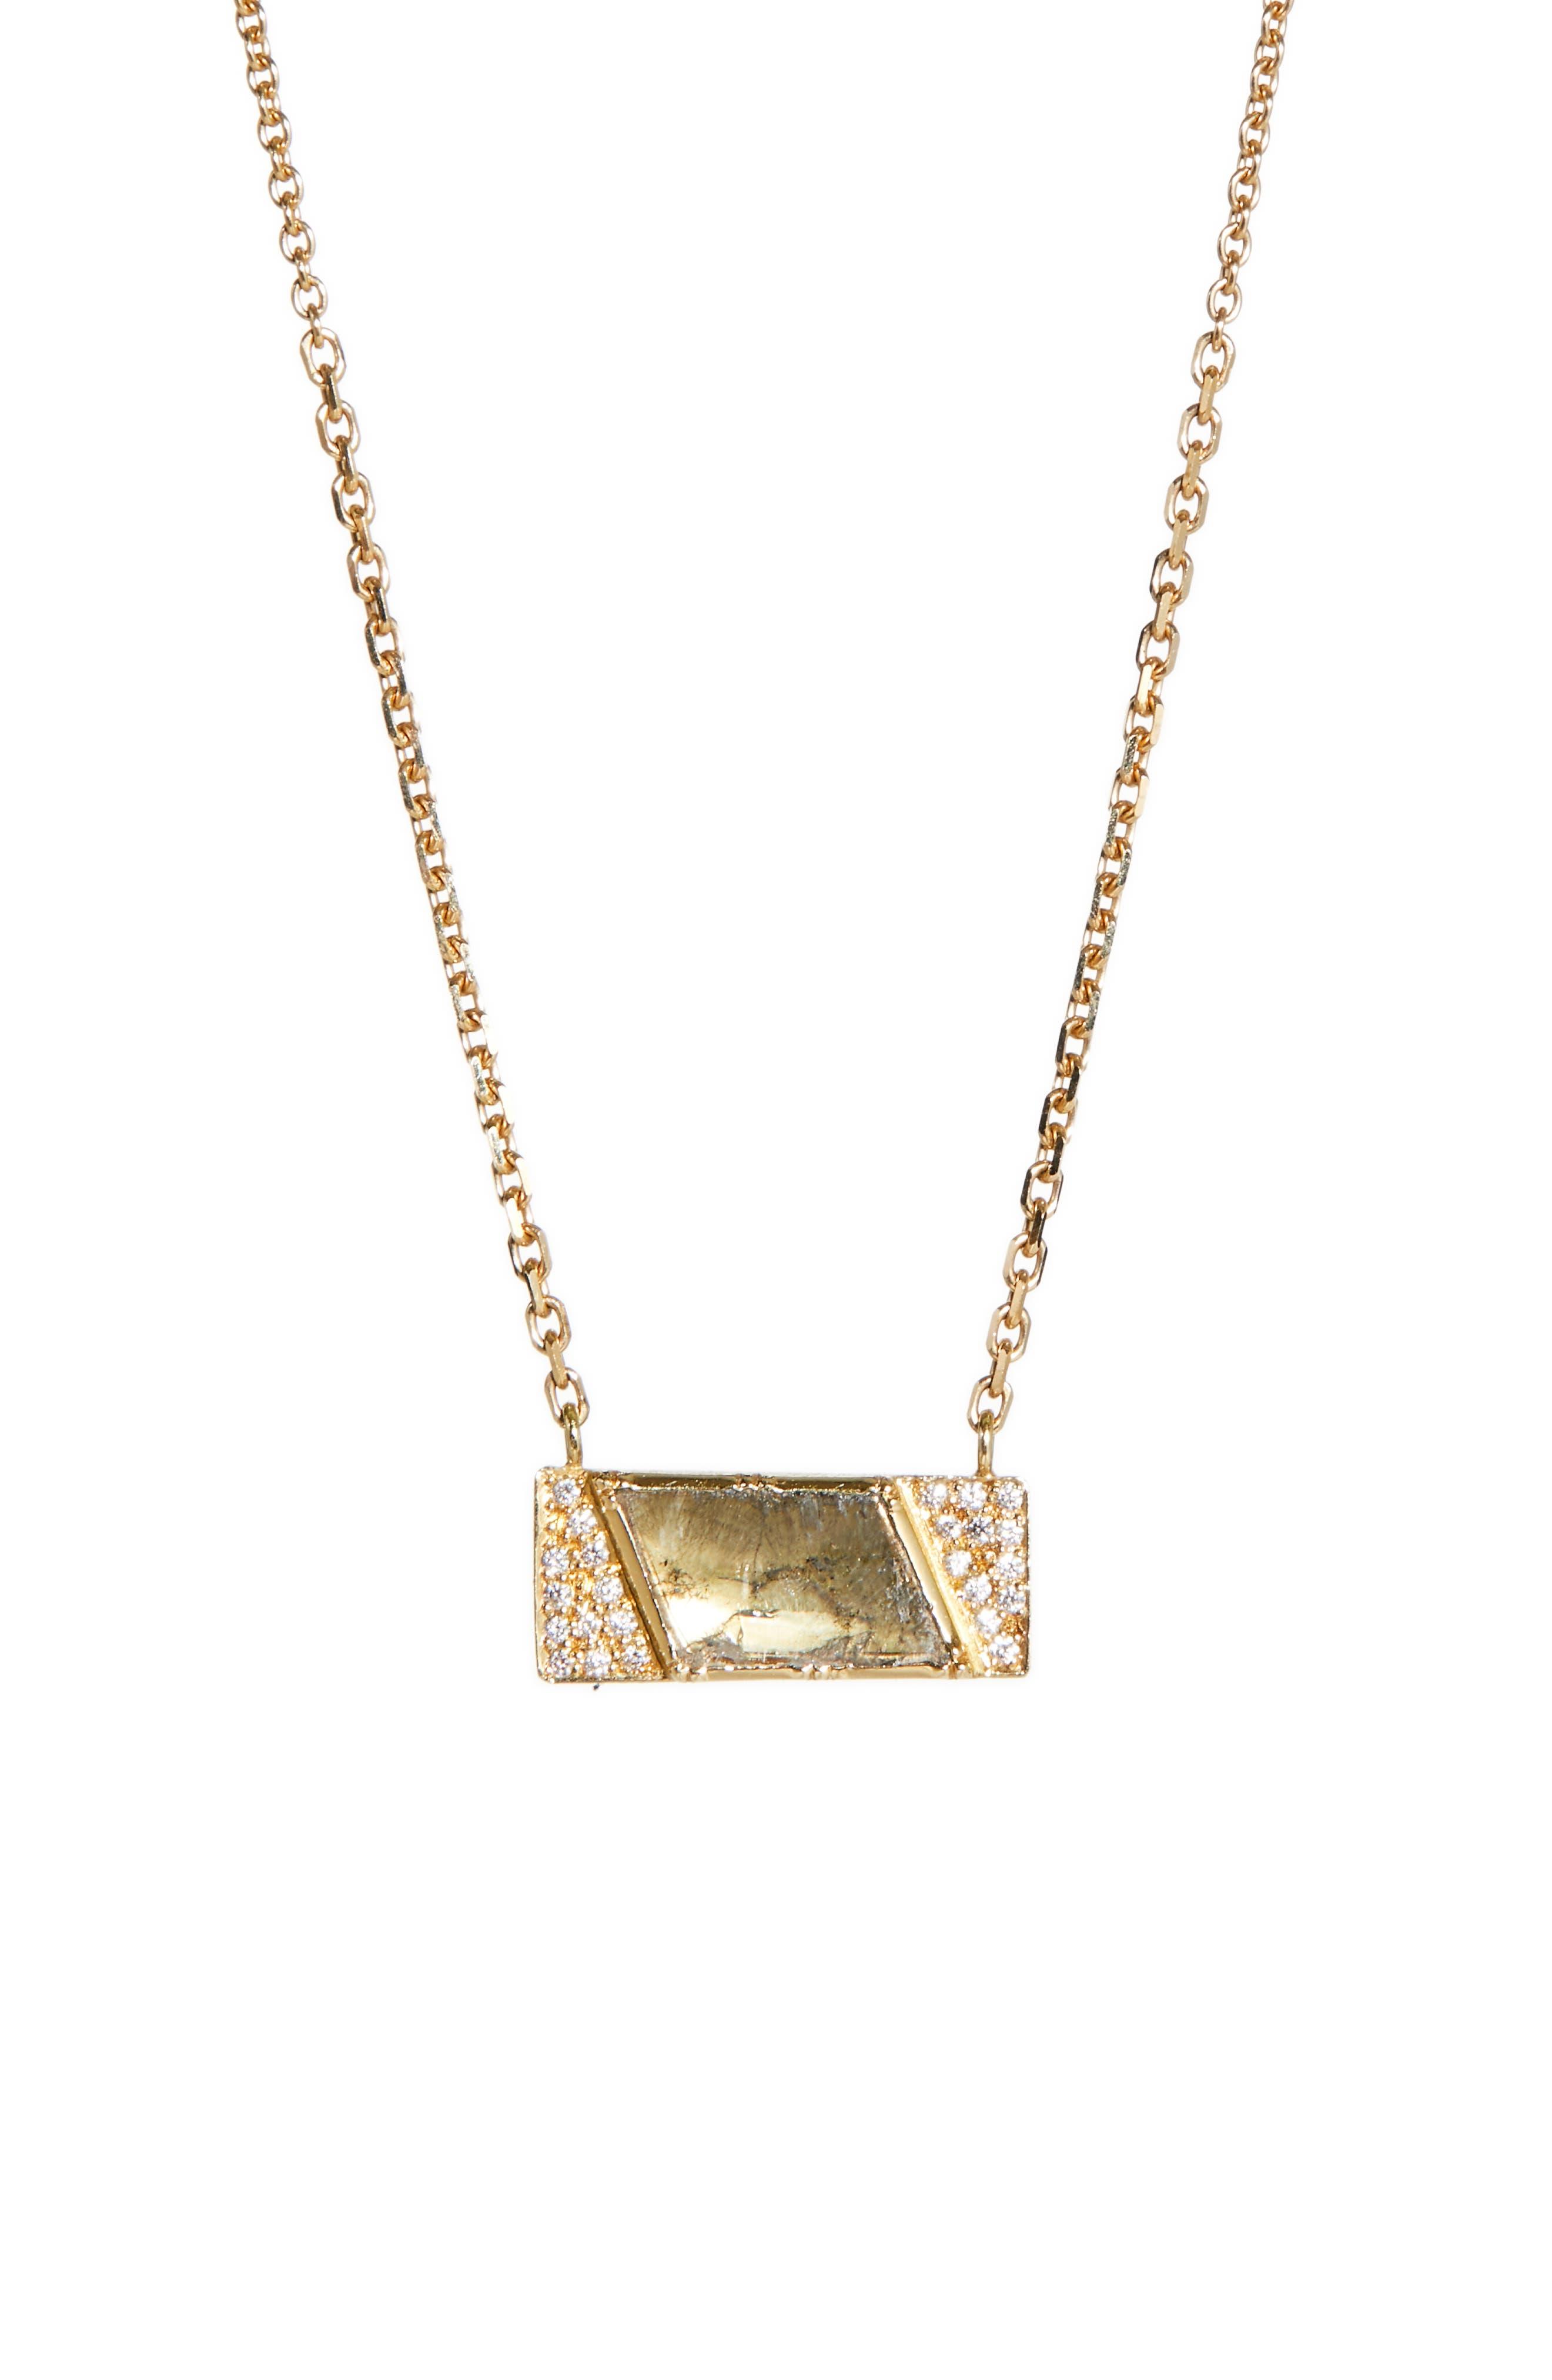 BROOKE GREGSON DIAMOND SLICE GEO HALO NECKLACE